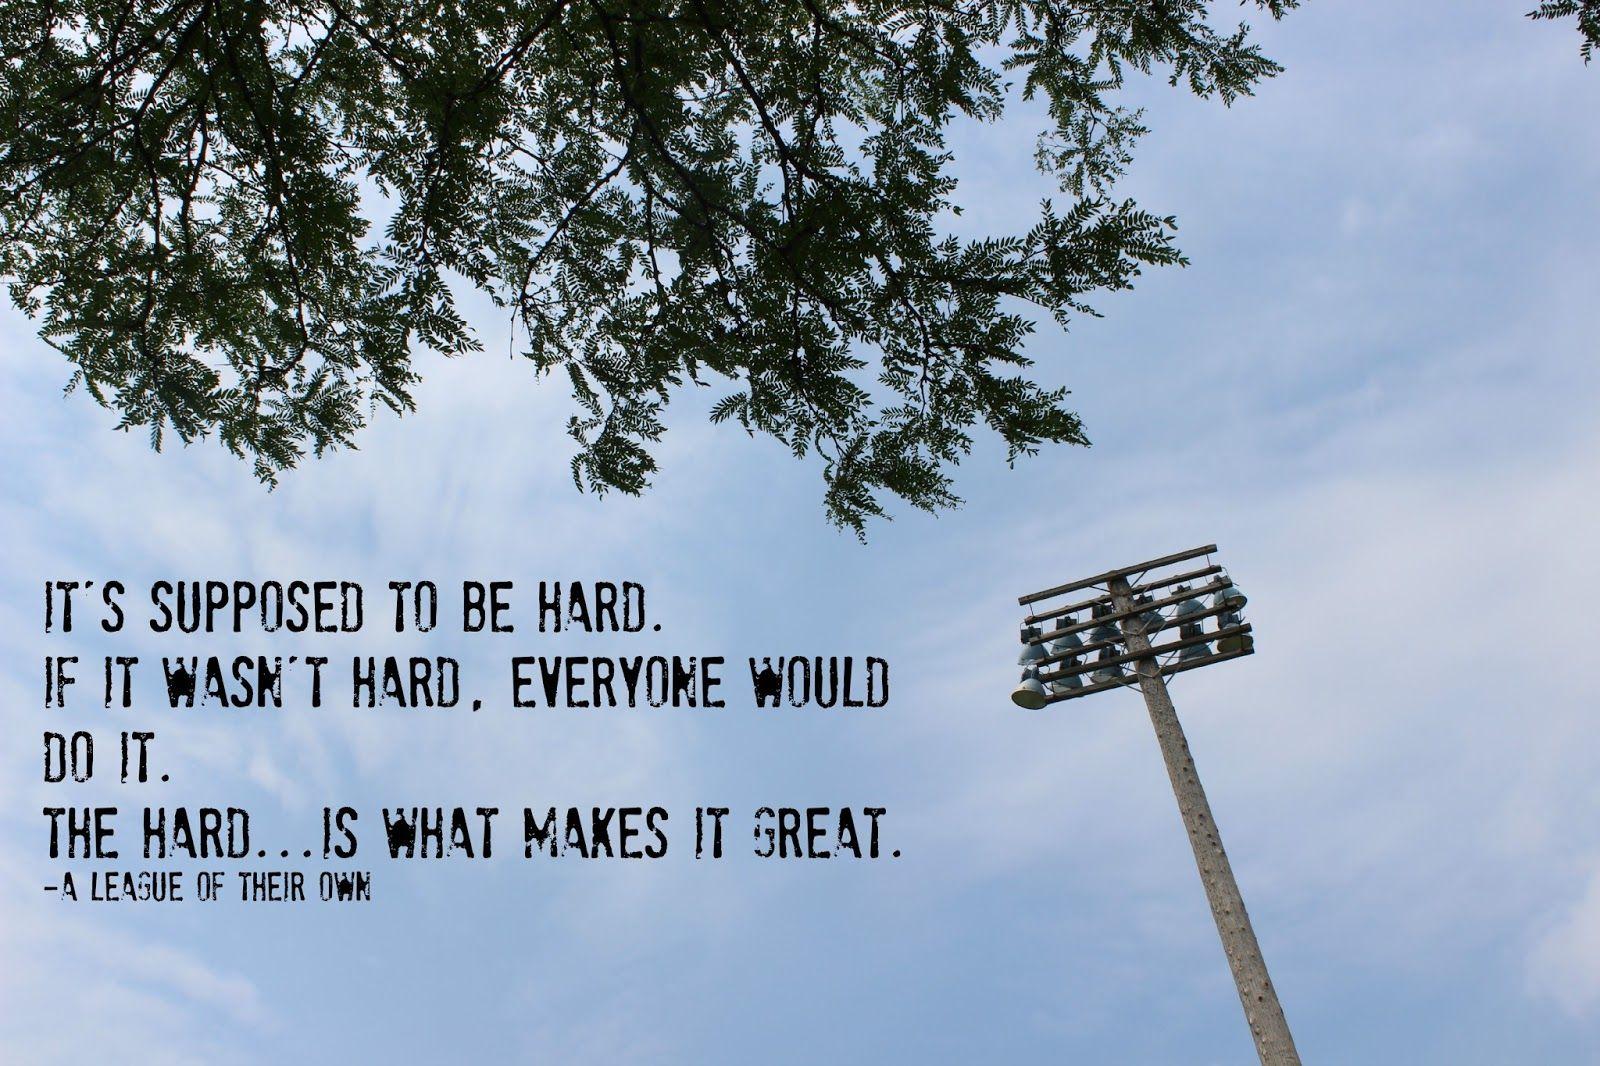 Baseball Quotes Hd Wallpaper 2 Hd Quotes Baseball Quotes Famous Baseball Quotes